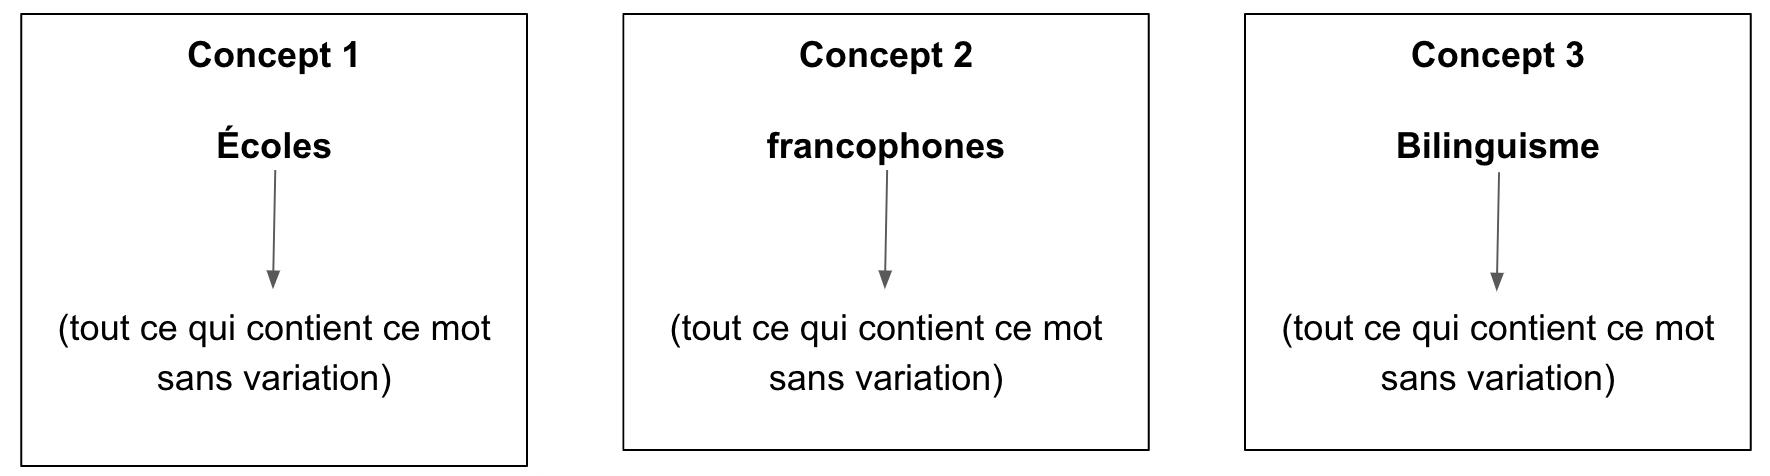 3 Concepts